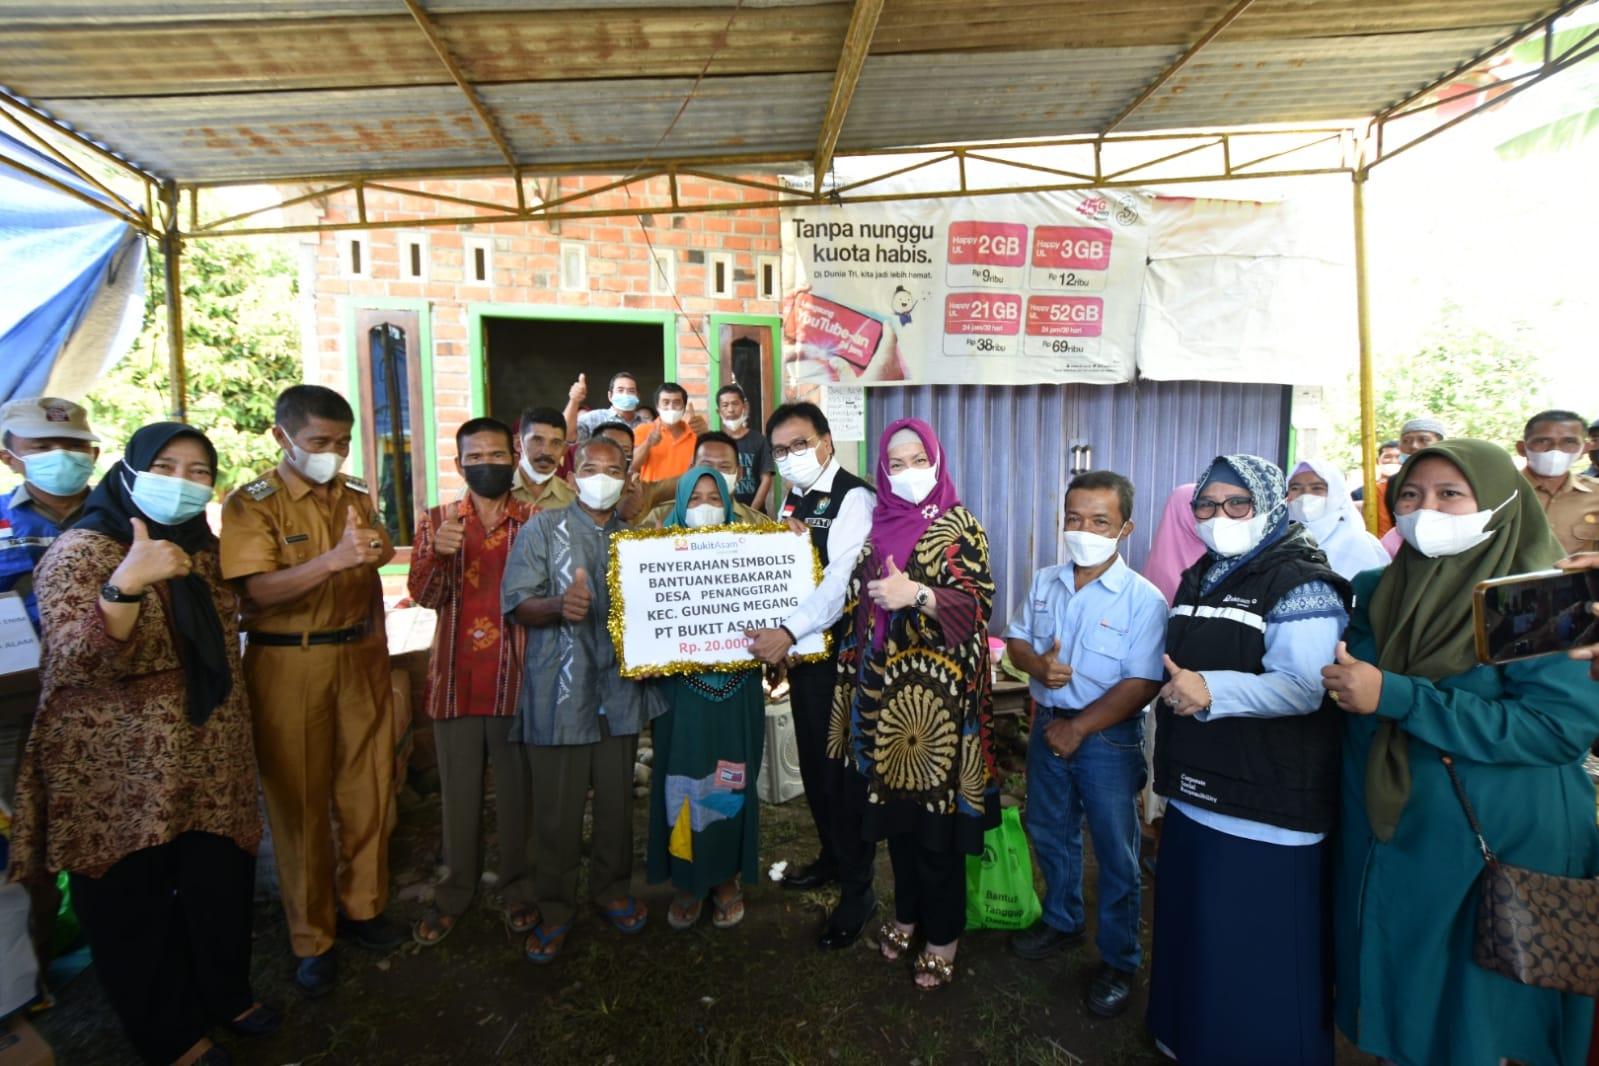 di kediaman anak dari korban kebakaran di Desa Penanggiran Kecamatan Gunung Megang, Senin [27/09/2021], PJ Bupati Muara Enim Nasrun Umar menyampaikan langsung uang santunan senilai Rp20 juta dari PTBA untuk Mawi dan keluarganya.